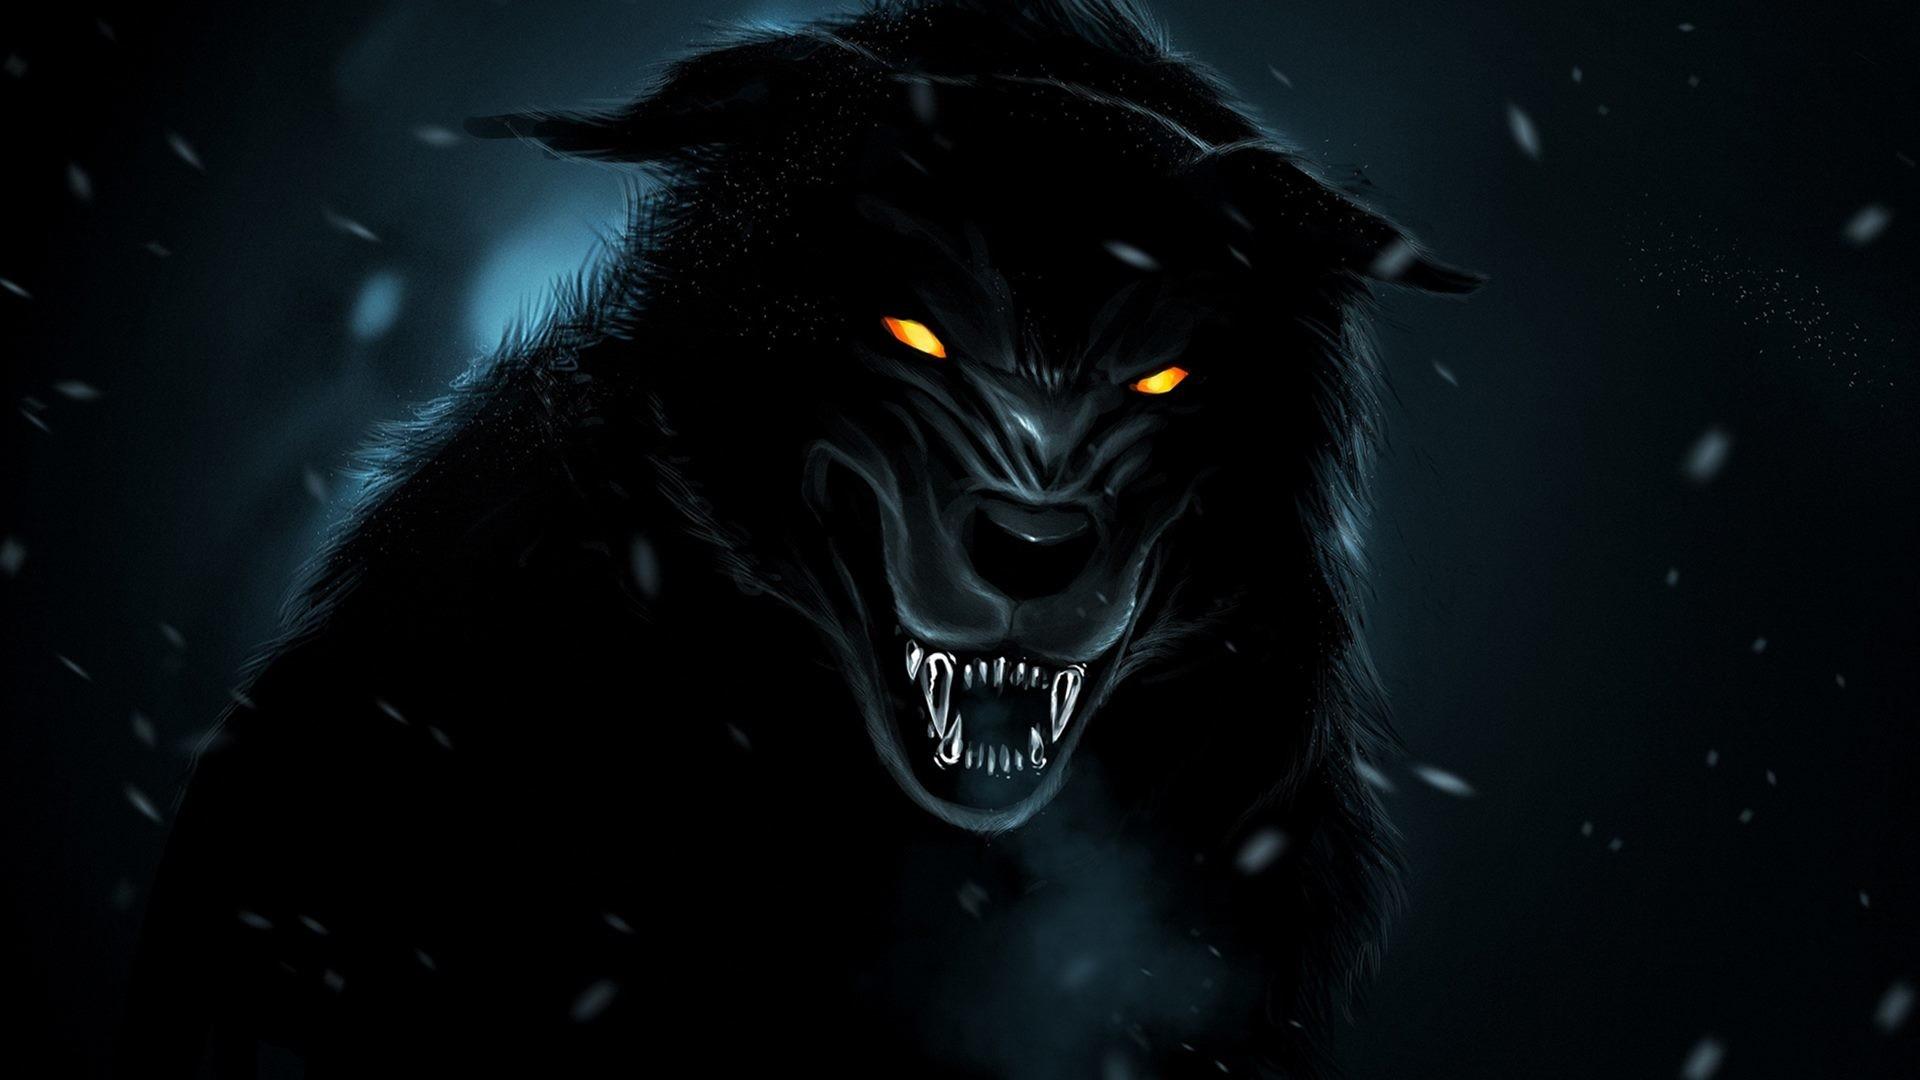 Black Werewolf Wallpaper 62 Images